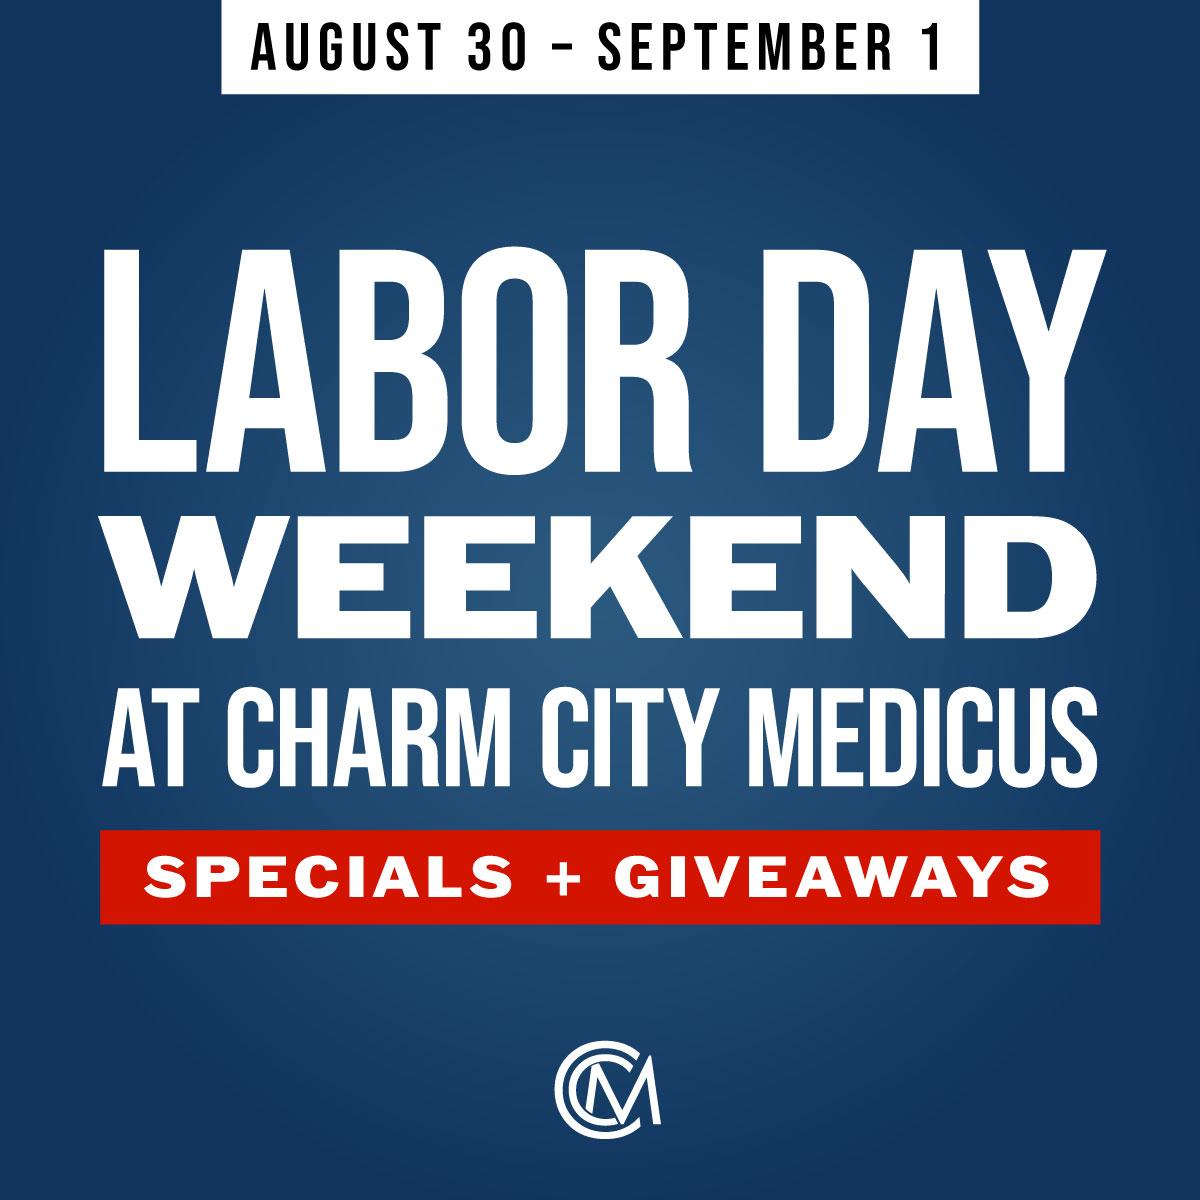 CCM-labor-day-specials.jpg